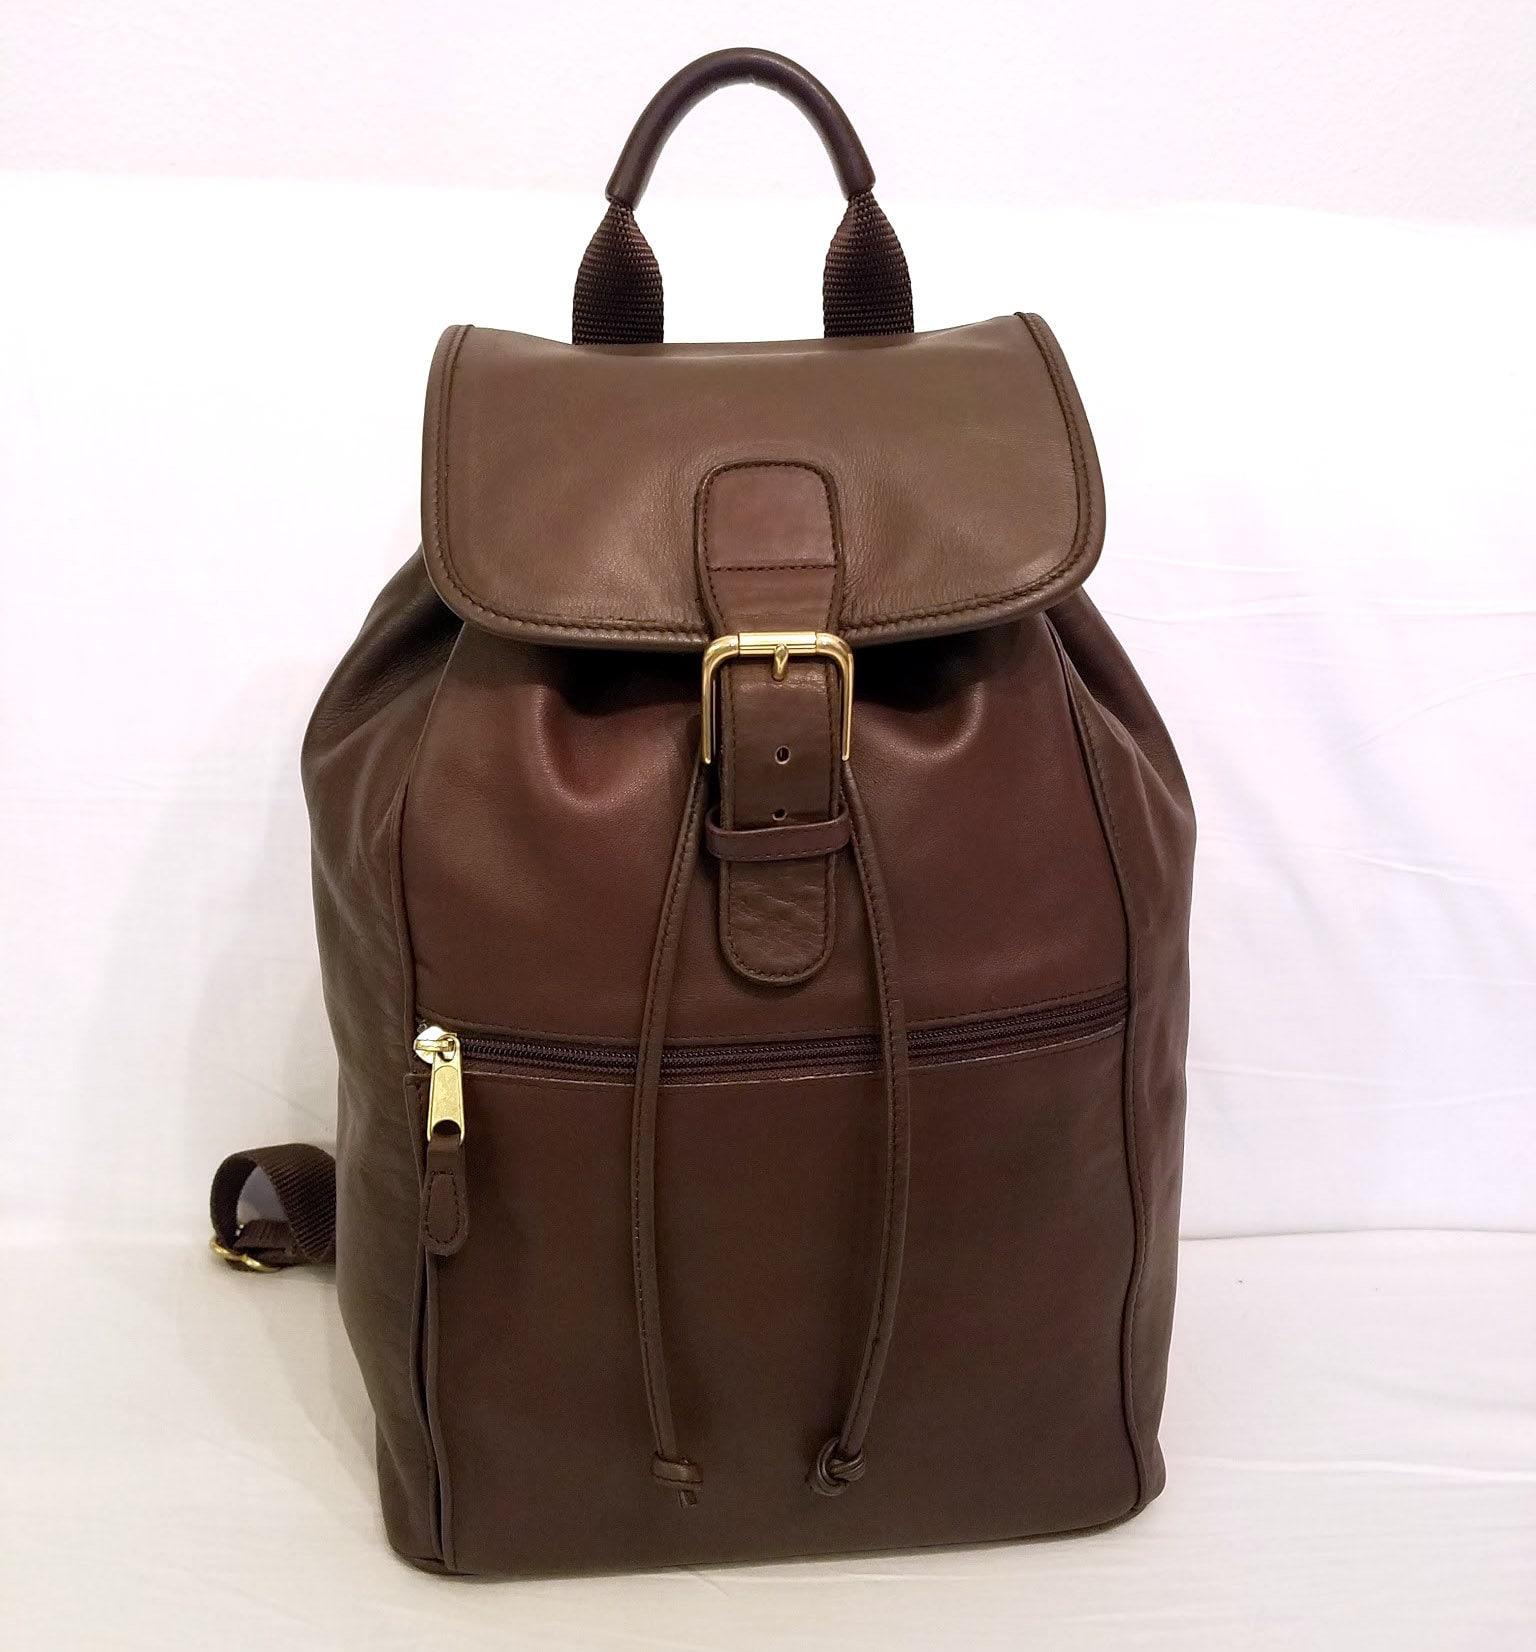 b7a64b7995 HUGE Coach Vintage Backpack Drawstring Brown Leather Bag | Etsy